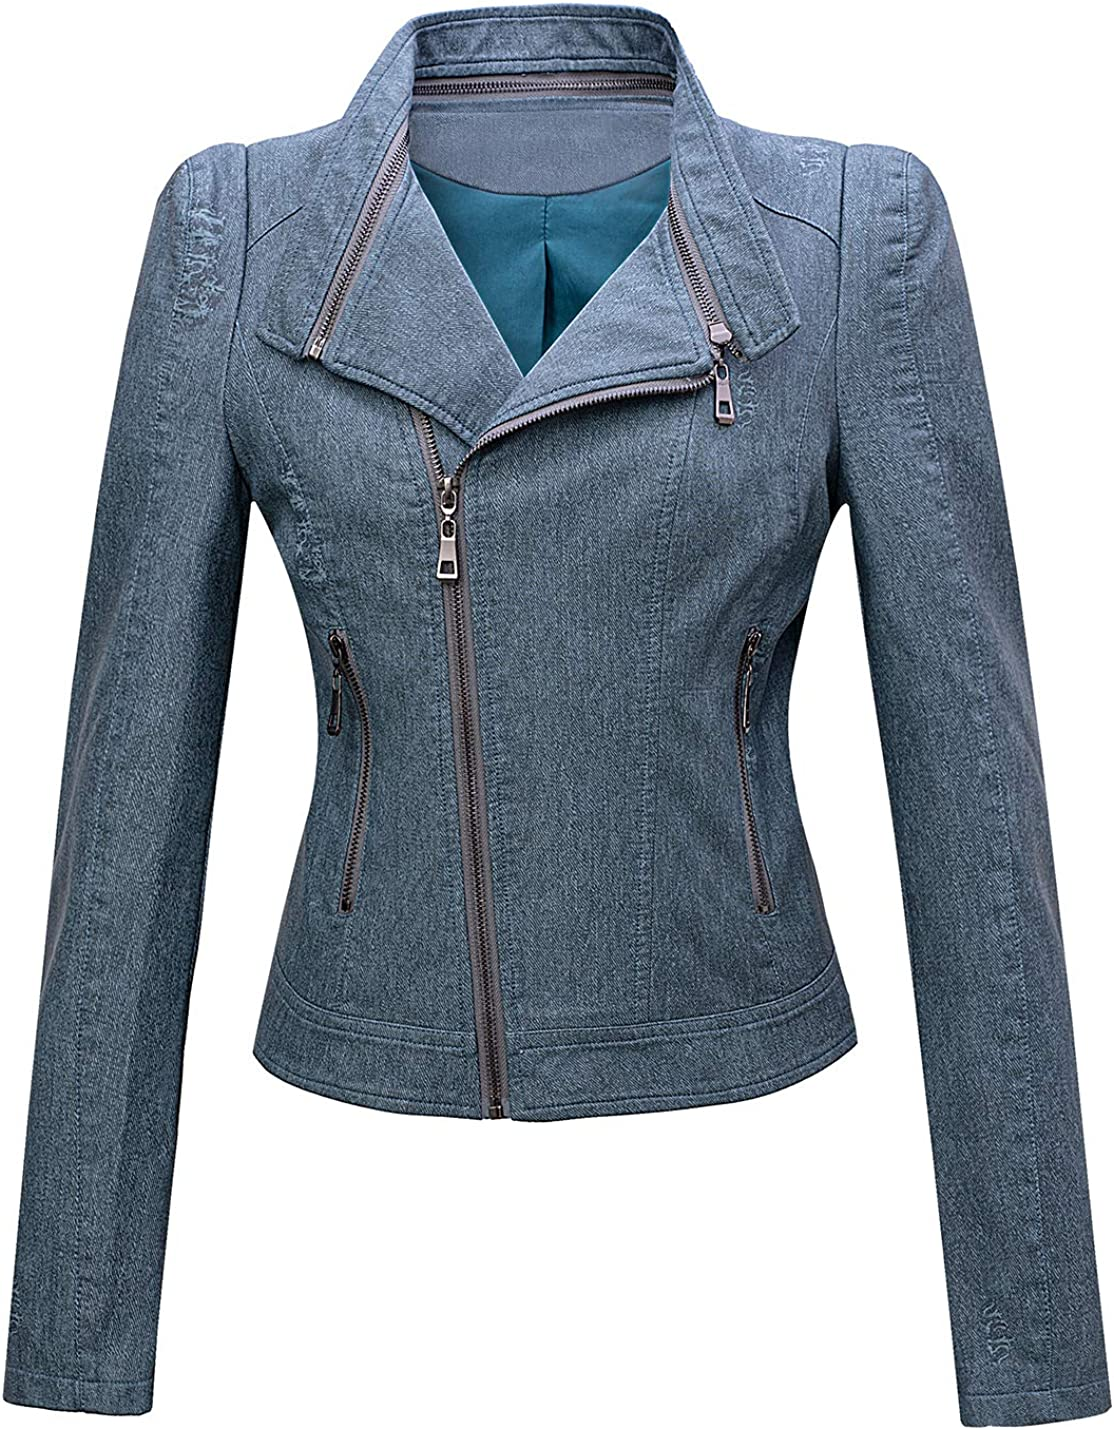 Tanming Womens Casual Slim Denim Look Faux Leather Zipper Up Moto Biker Short Jacket